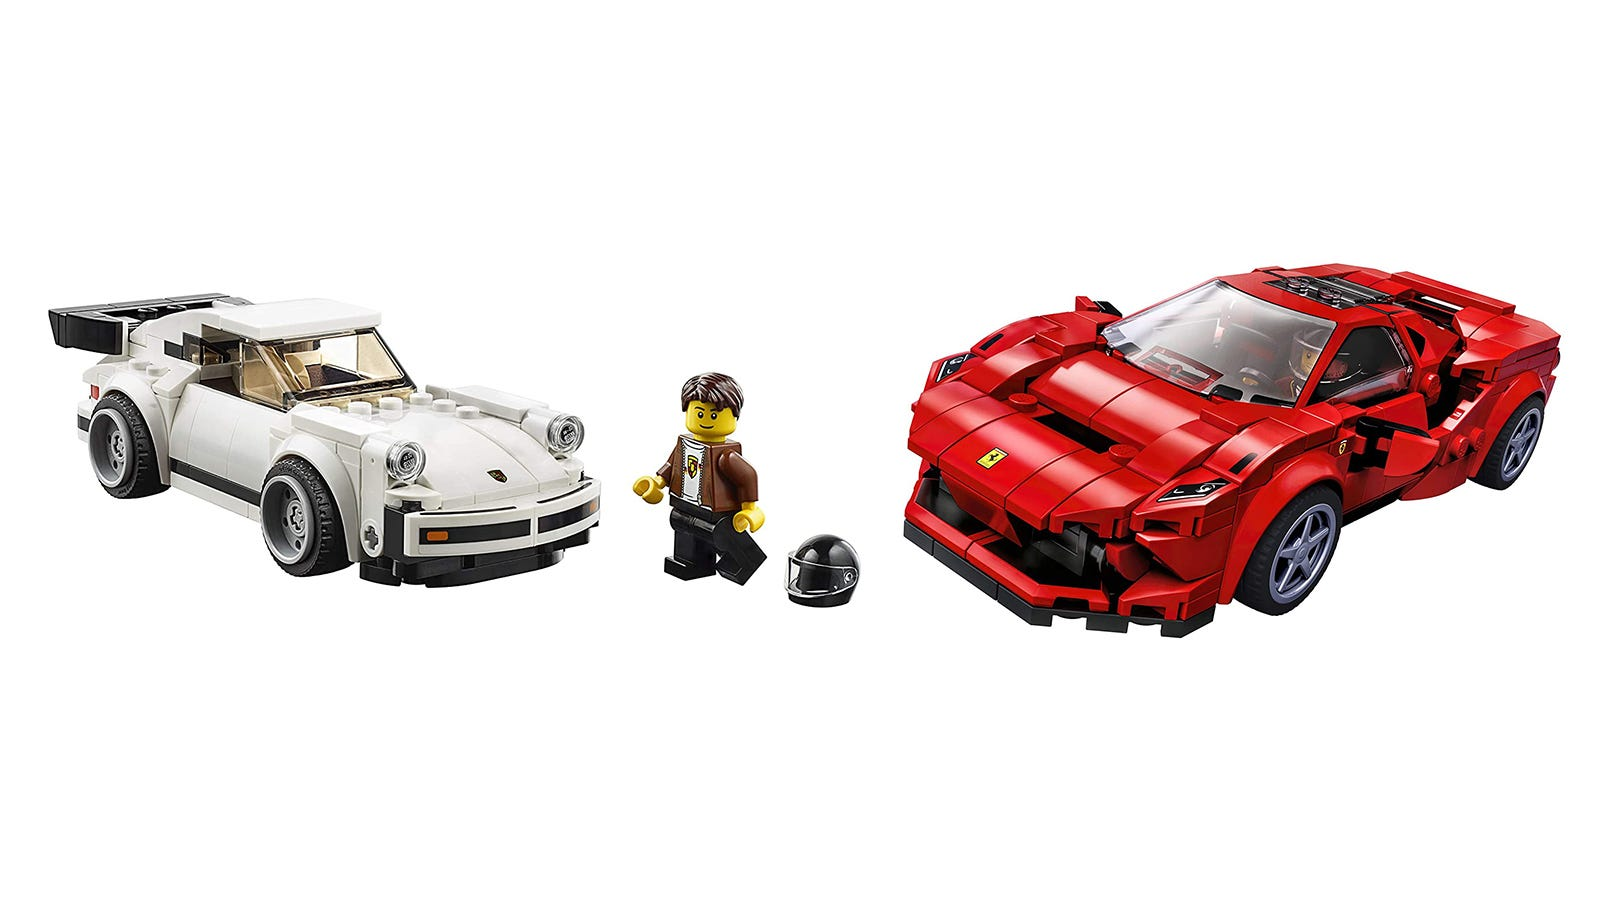 LEGO Speed Champions 1974 Porsche 911 Turbo and Ferrari F8 Tributo